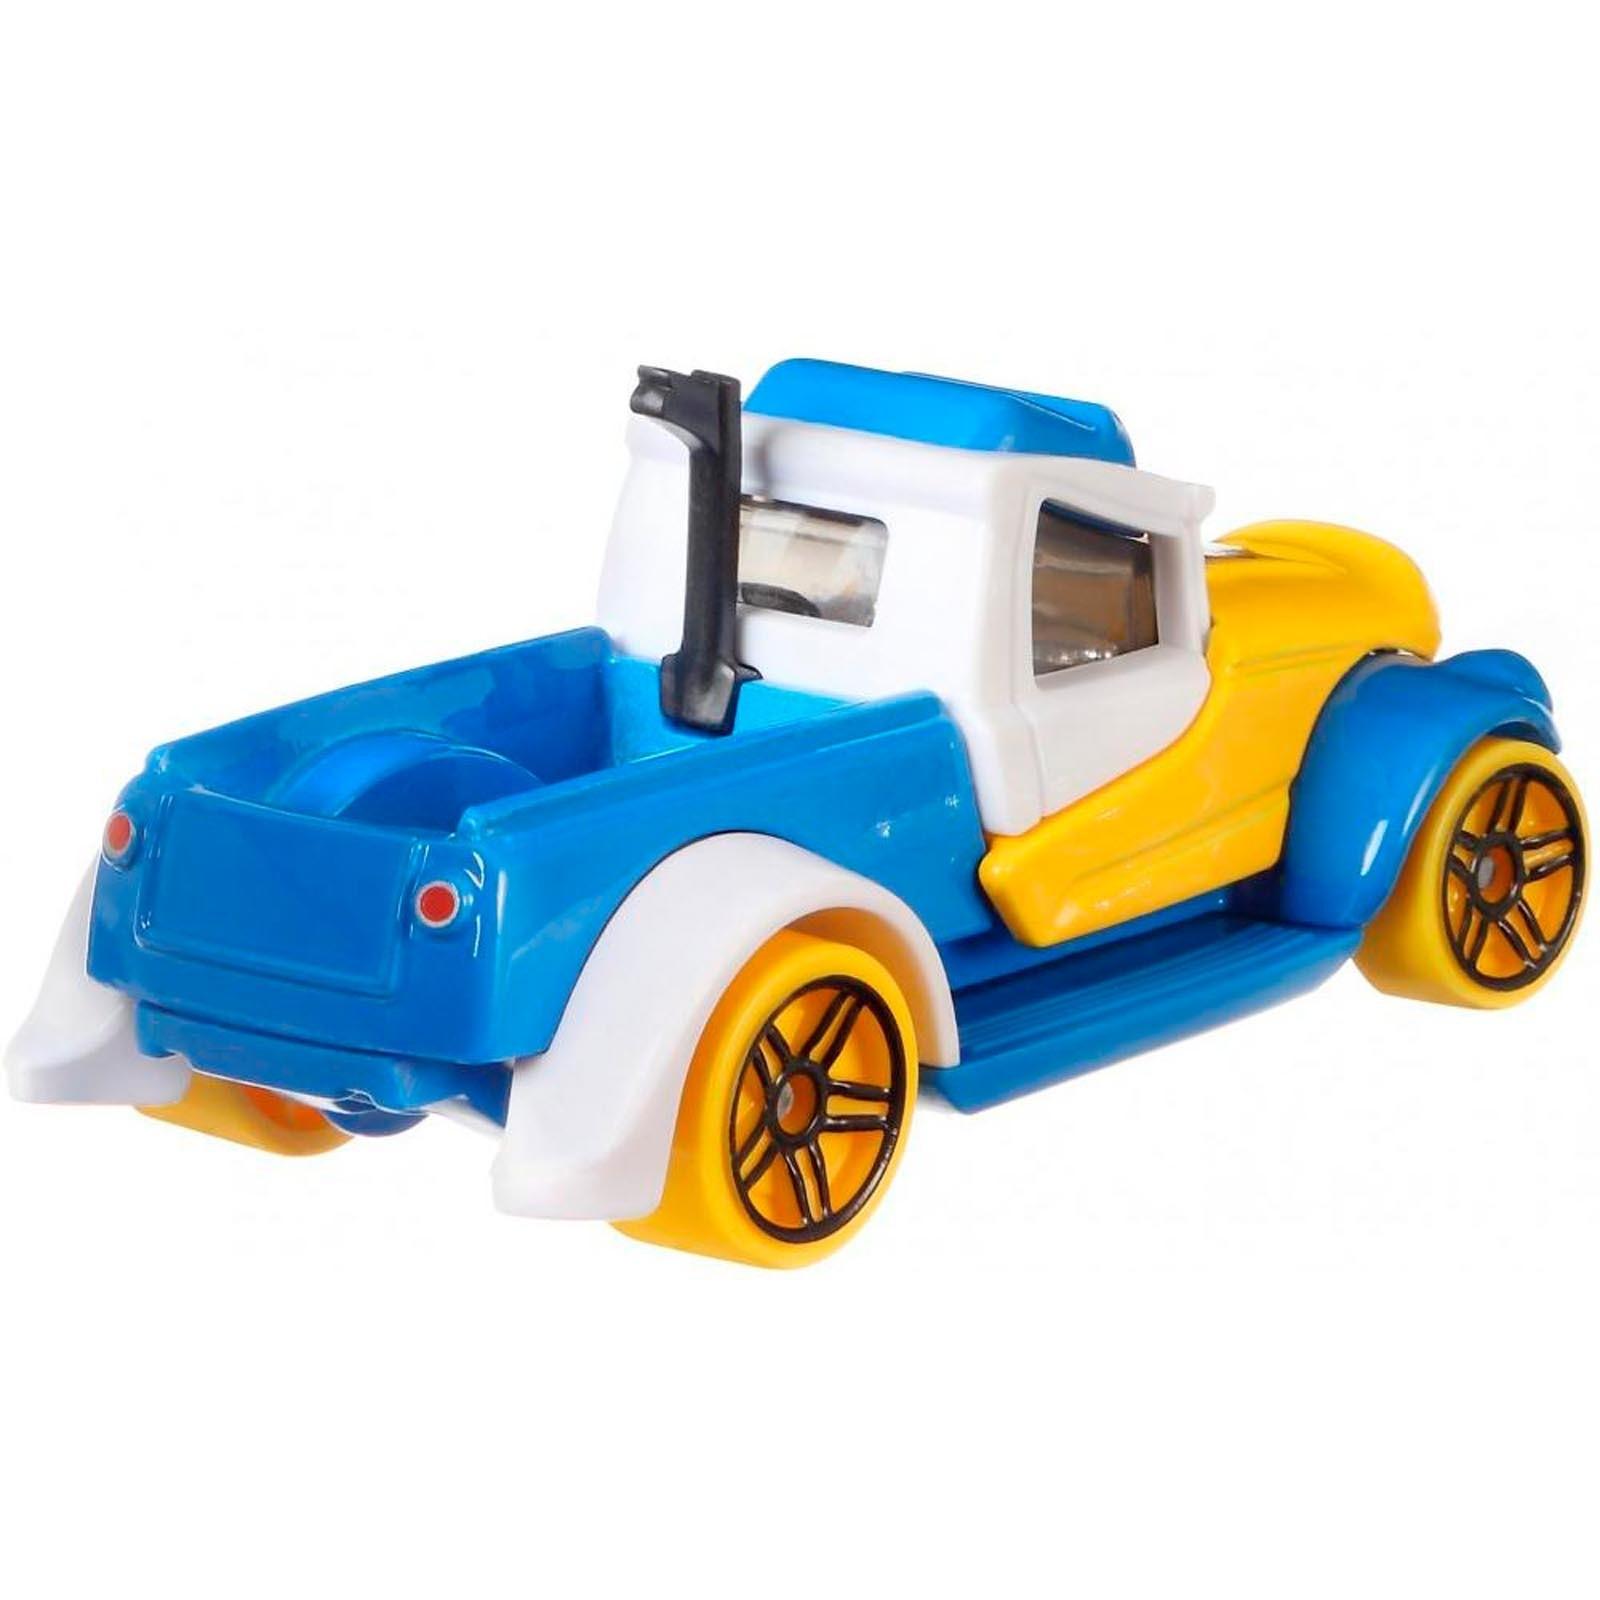 Hot Wheels - Pato Donald - Disney - Character Cars - FYV94